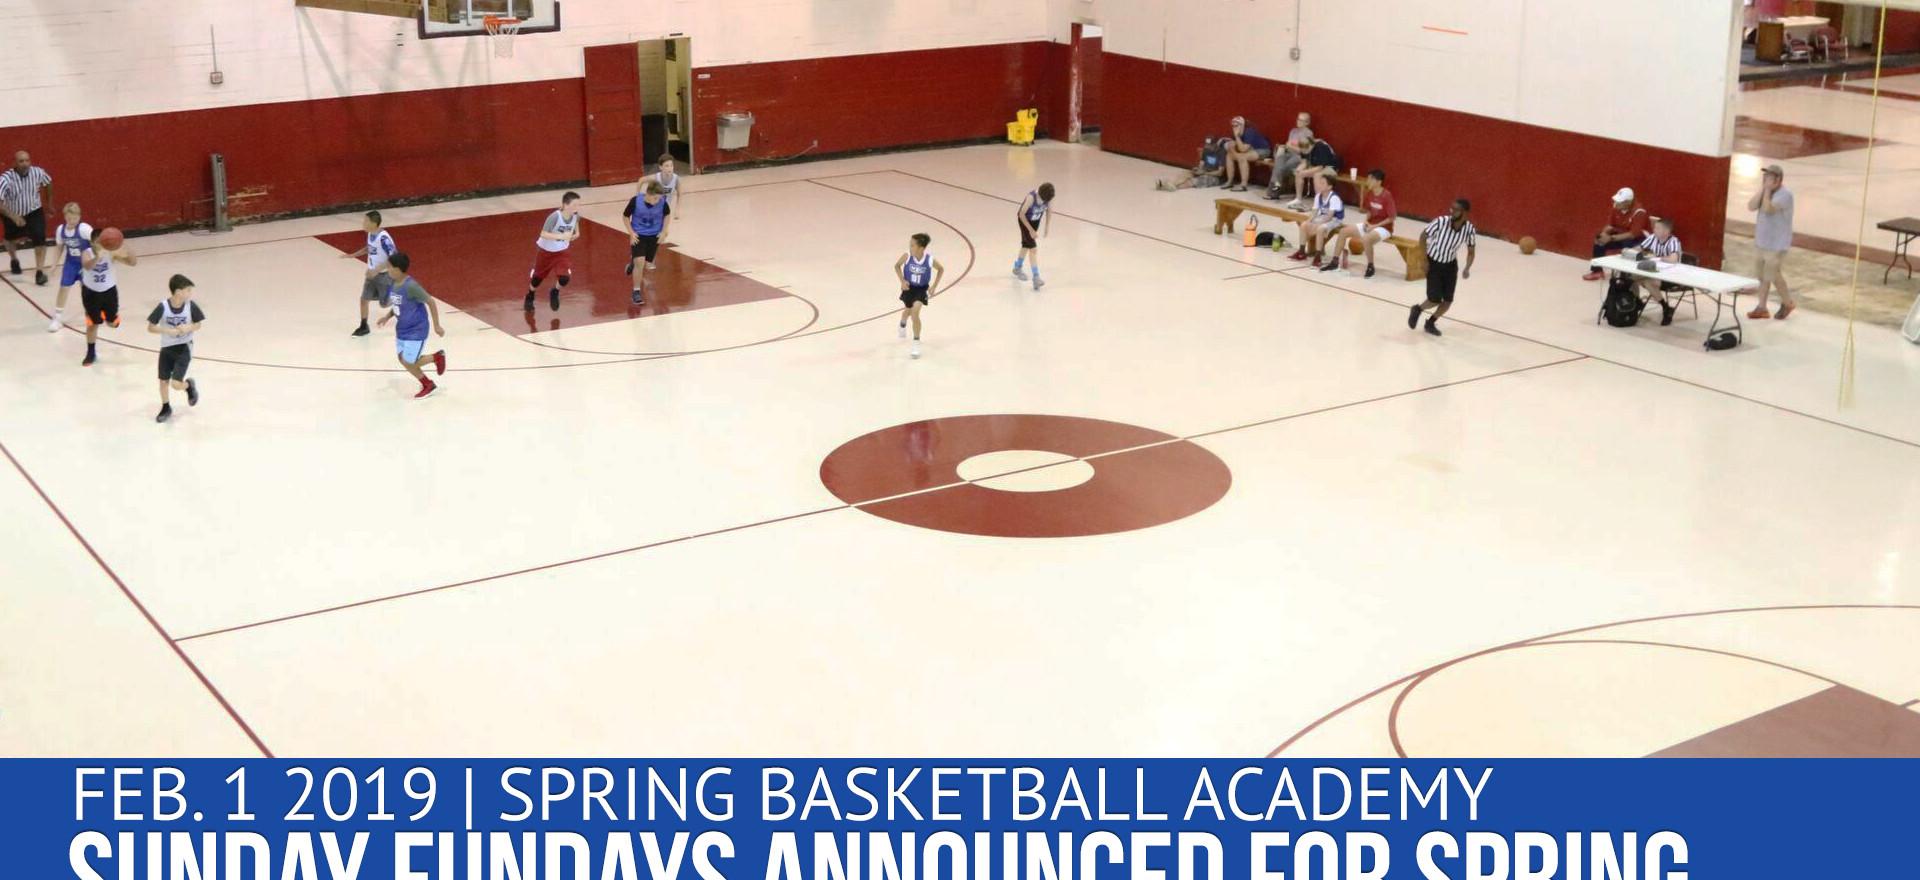 Spring Basketball Academy - Sunday Funda